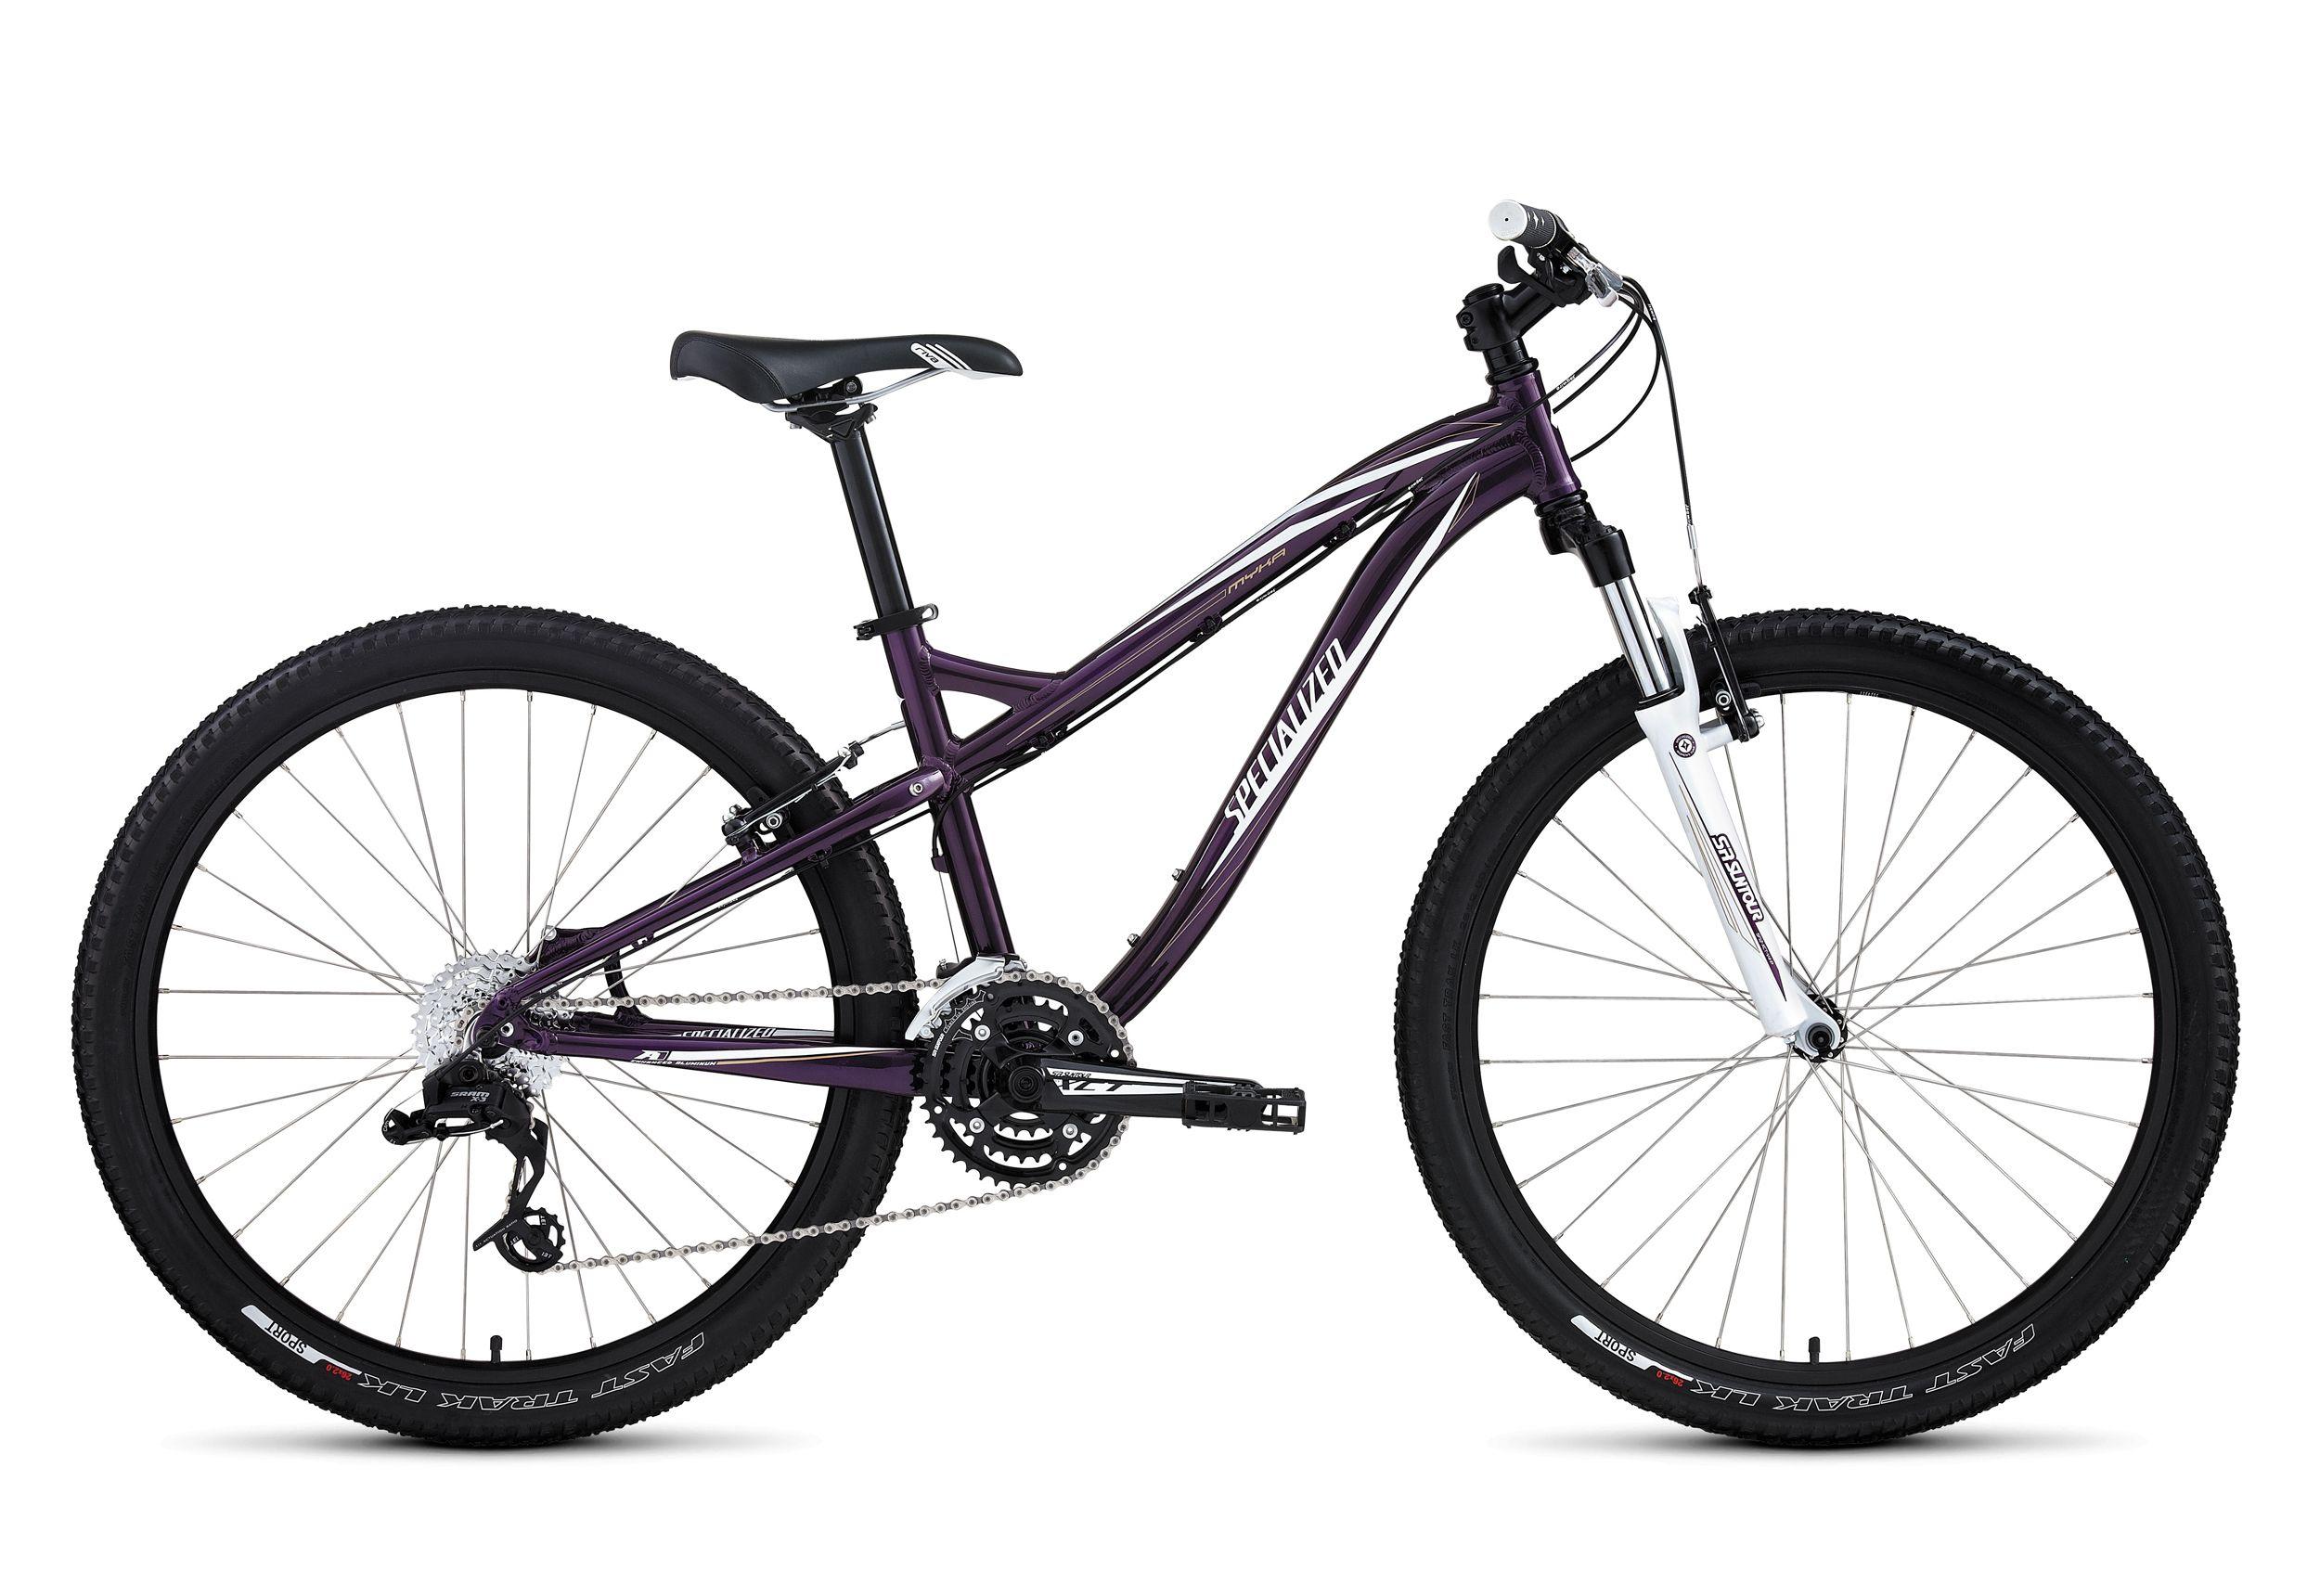 Specialized Myka Ht Base Mountain Bike Kolo I Want To Ride My Bicycle Bike